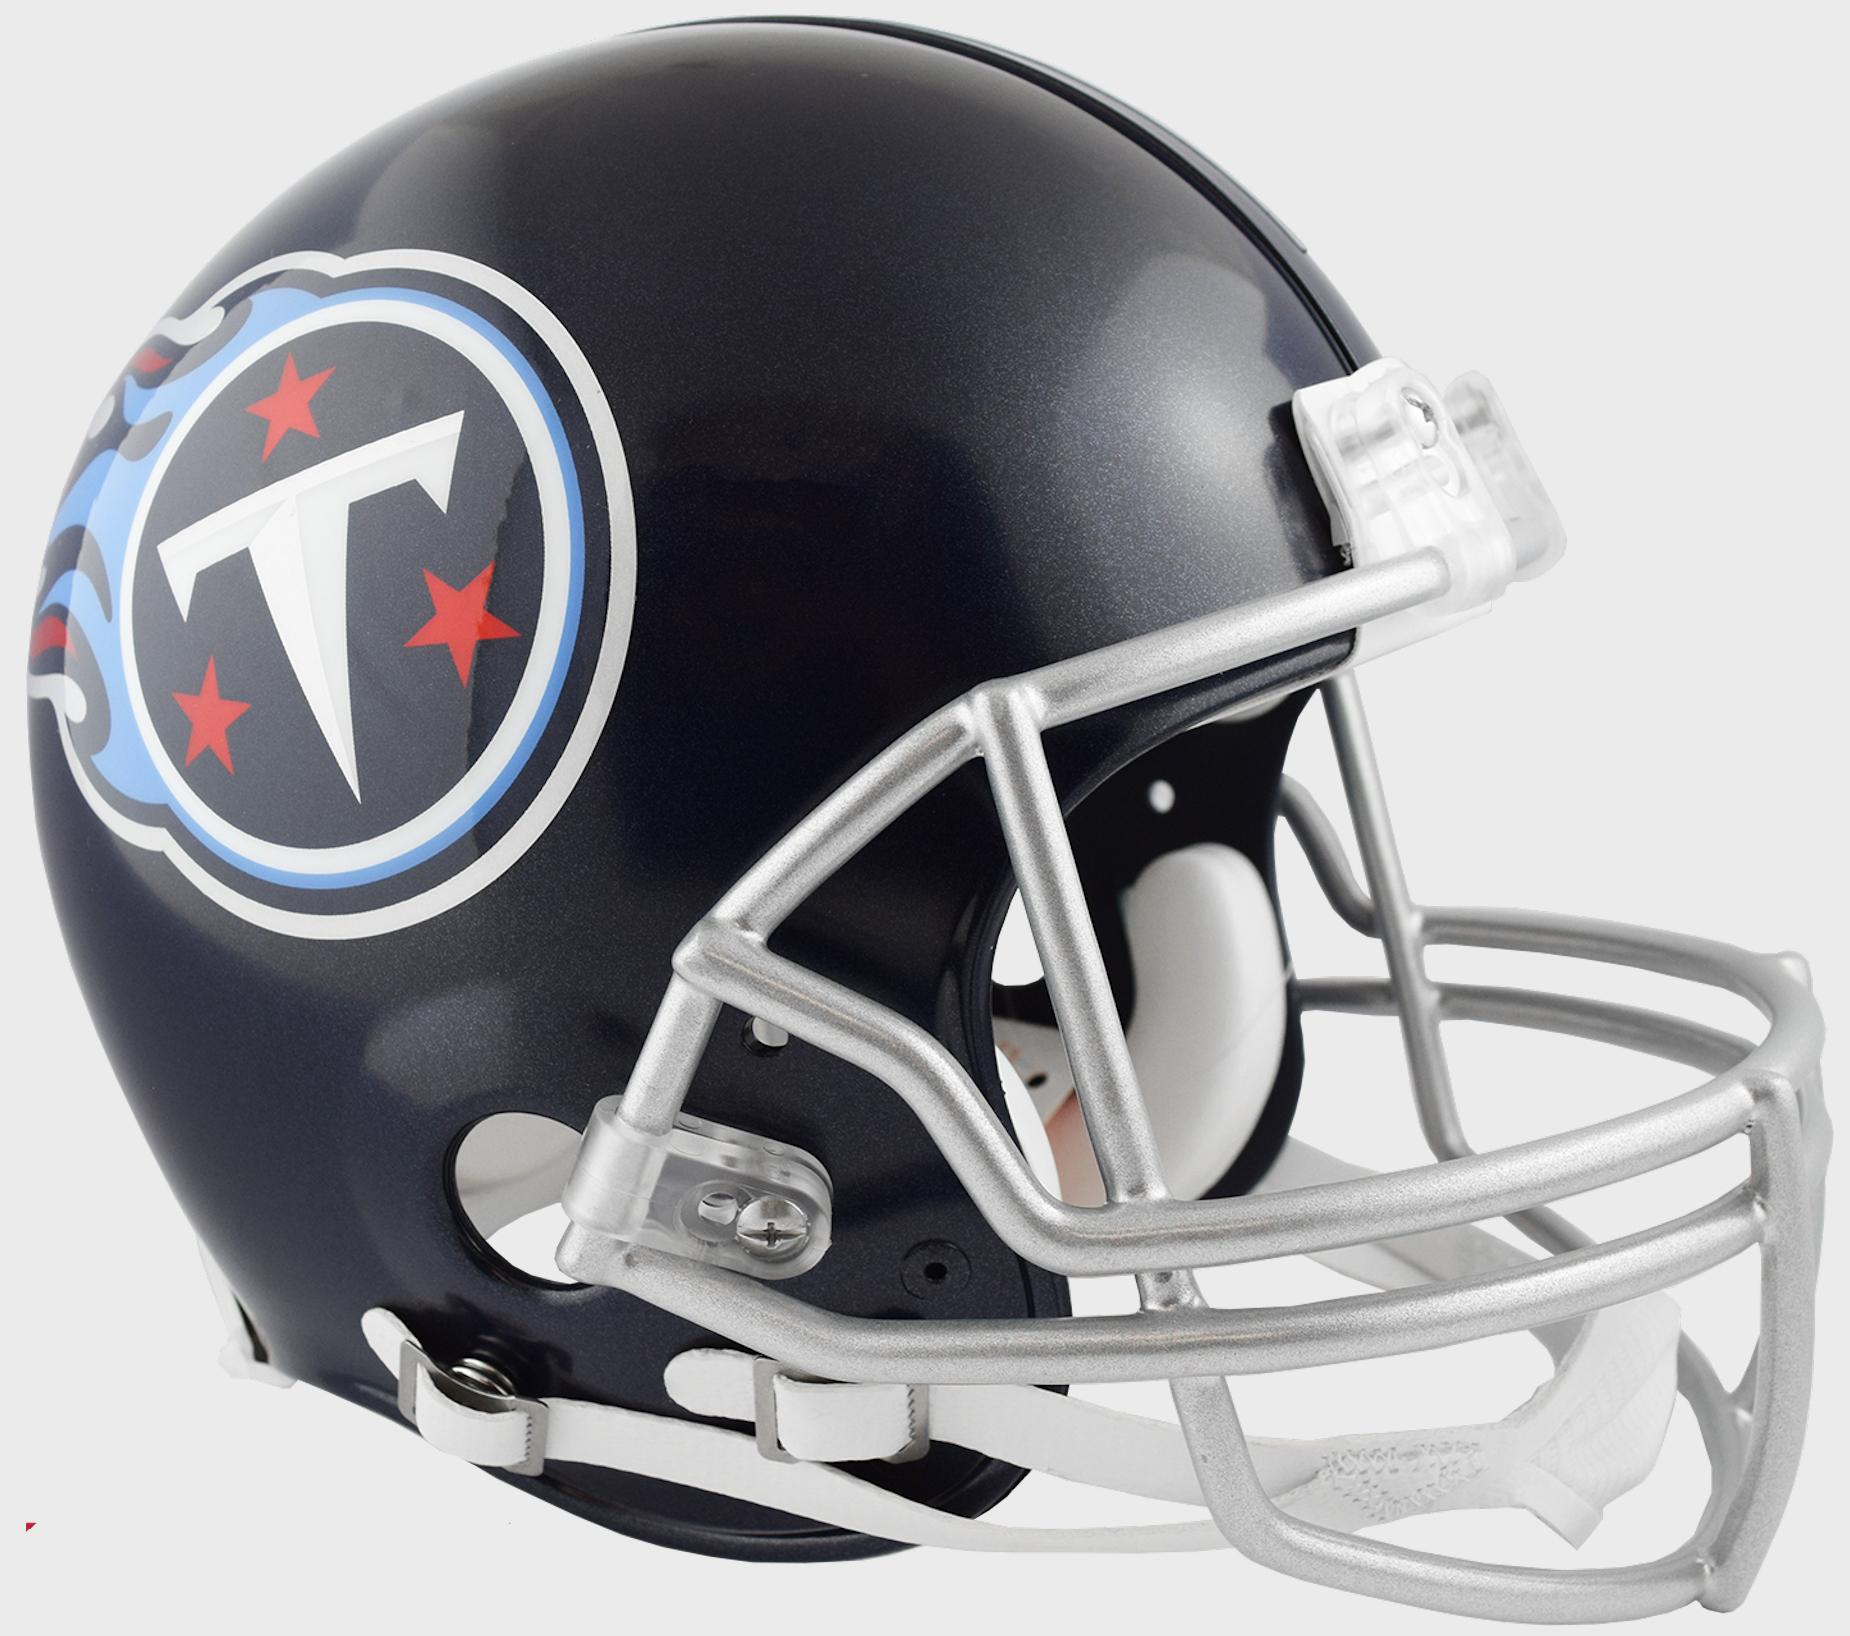 Tennessee Titans Football Helmet <B>Satin Navy Metallic</B>